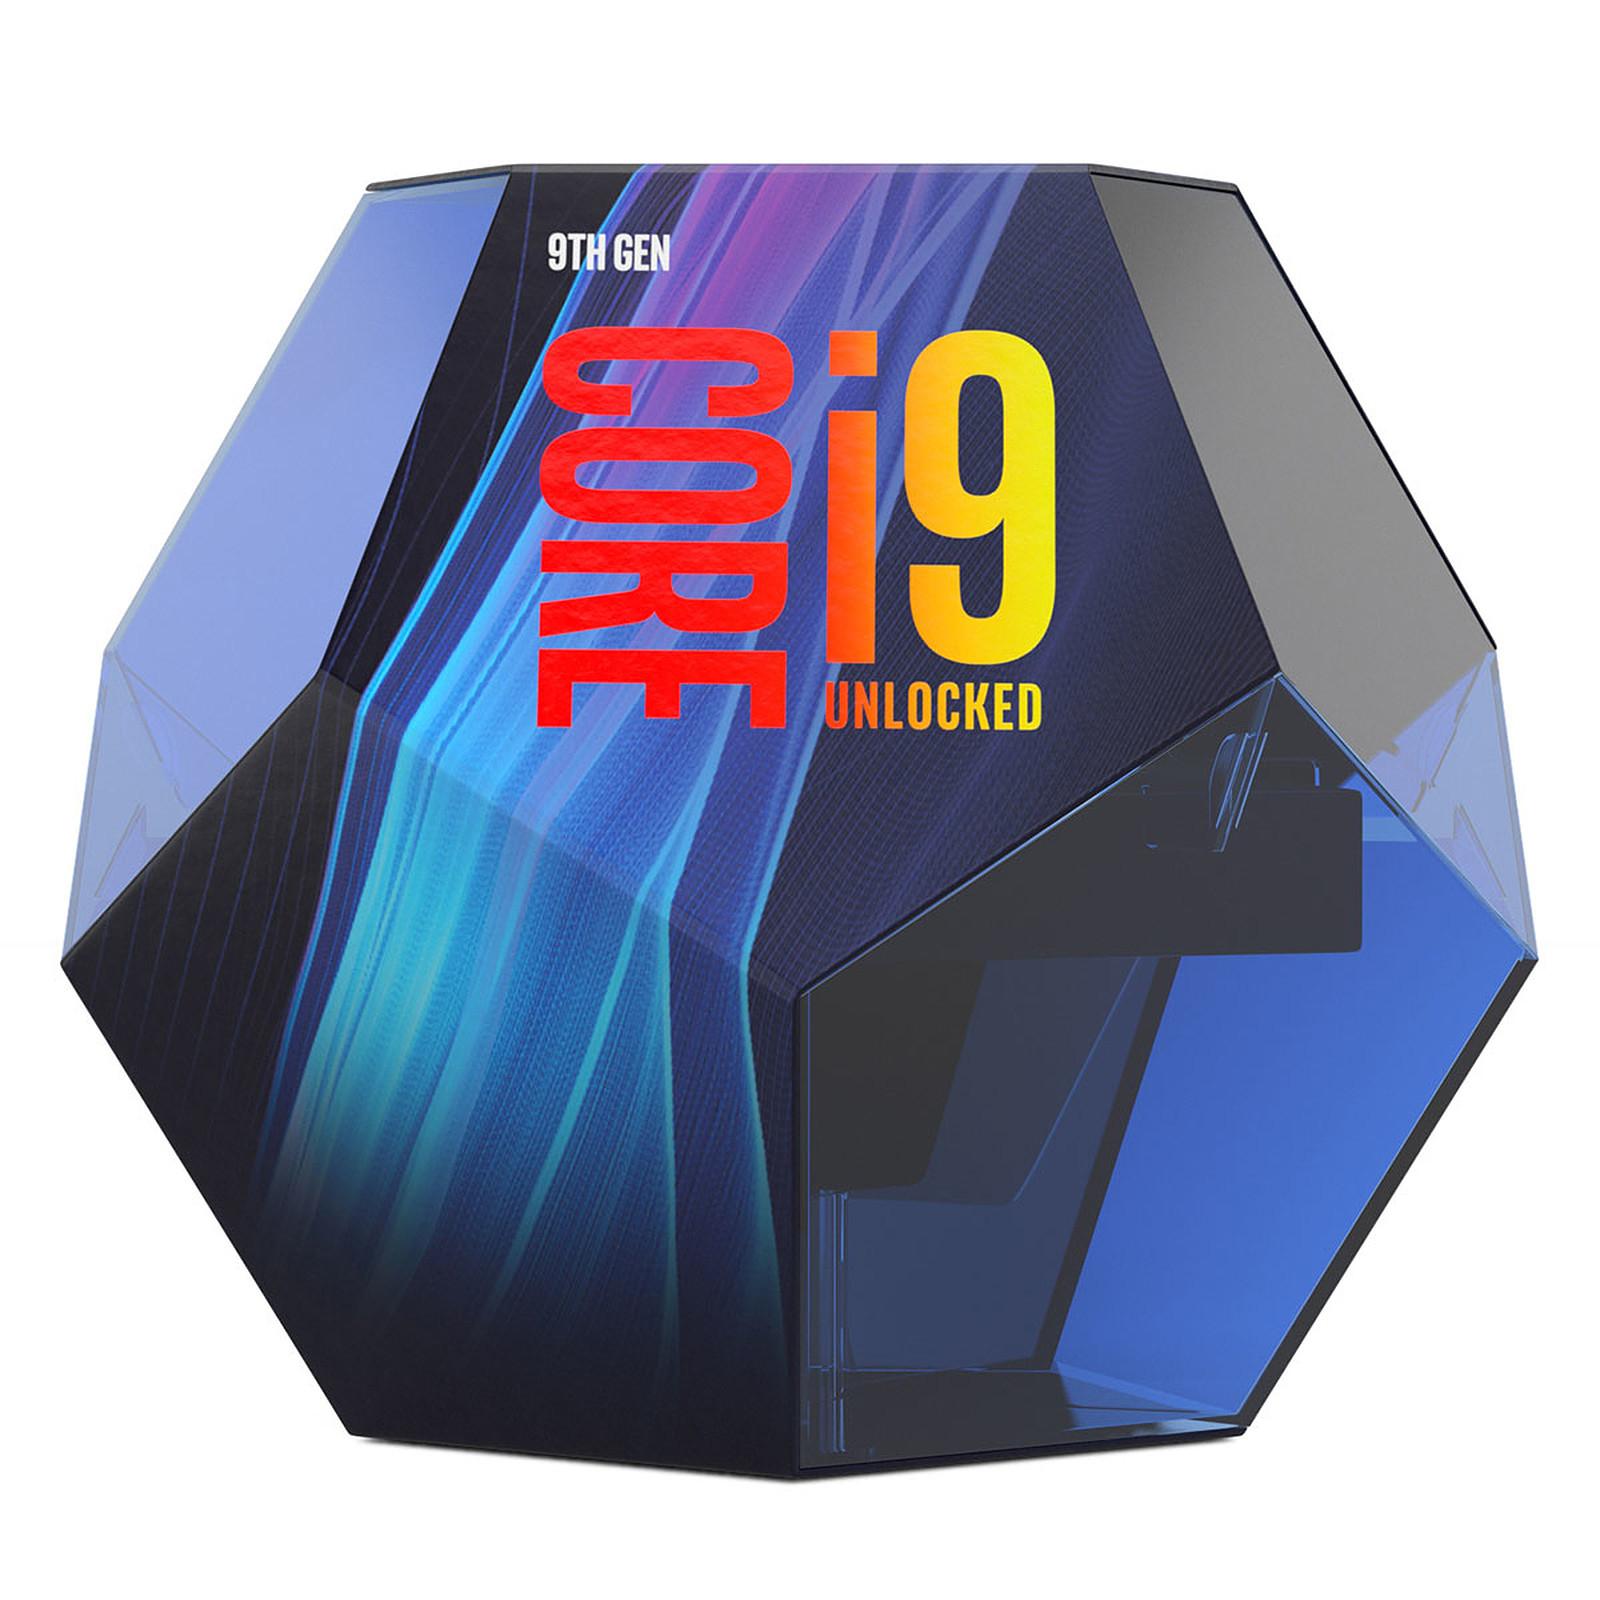 Processeur Intel Core i9 9900KS (4,0/5,0 GHz)